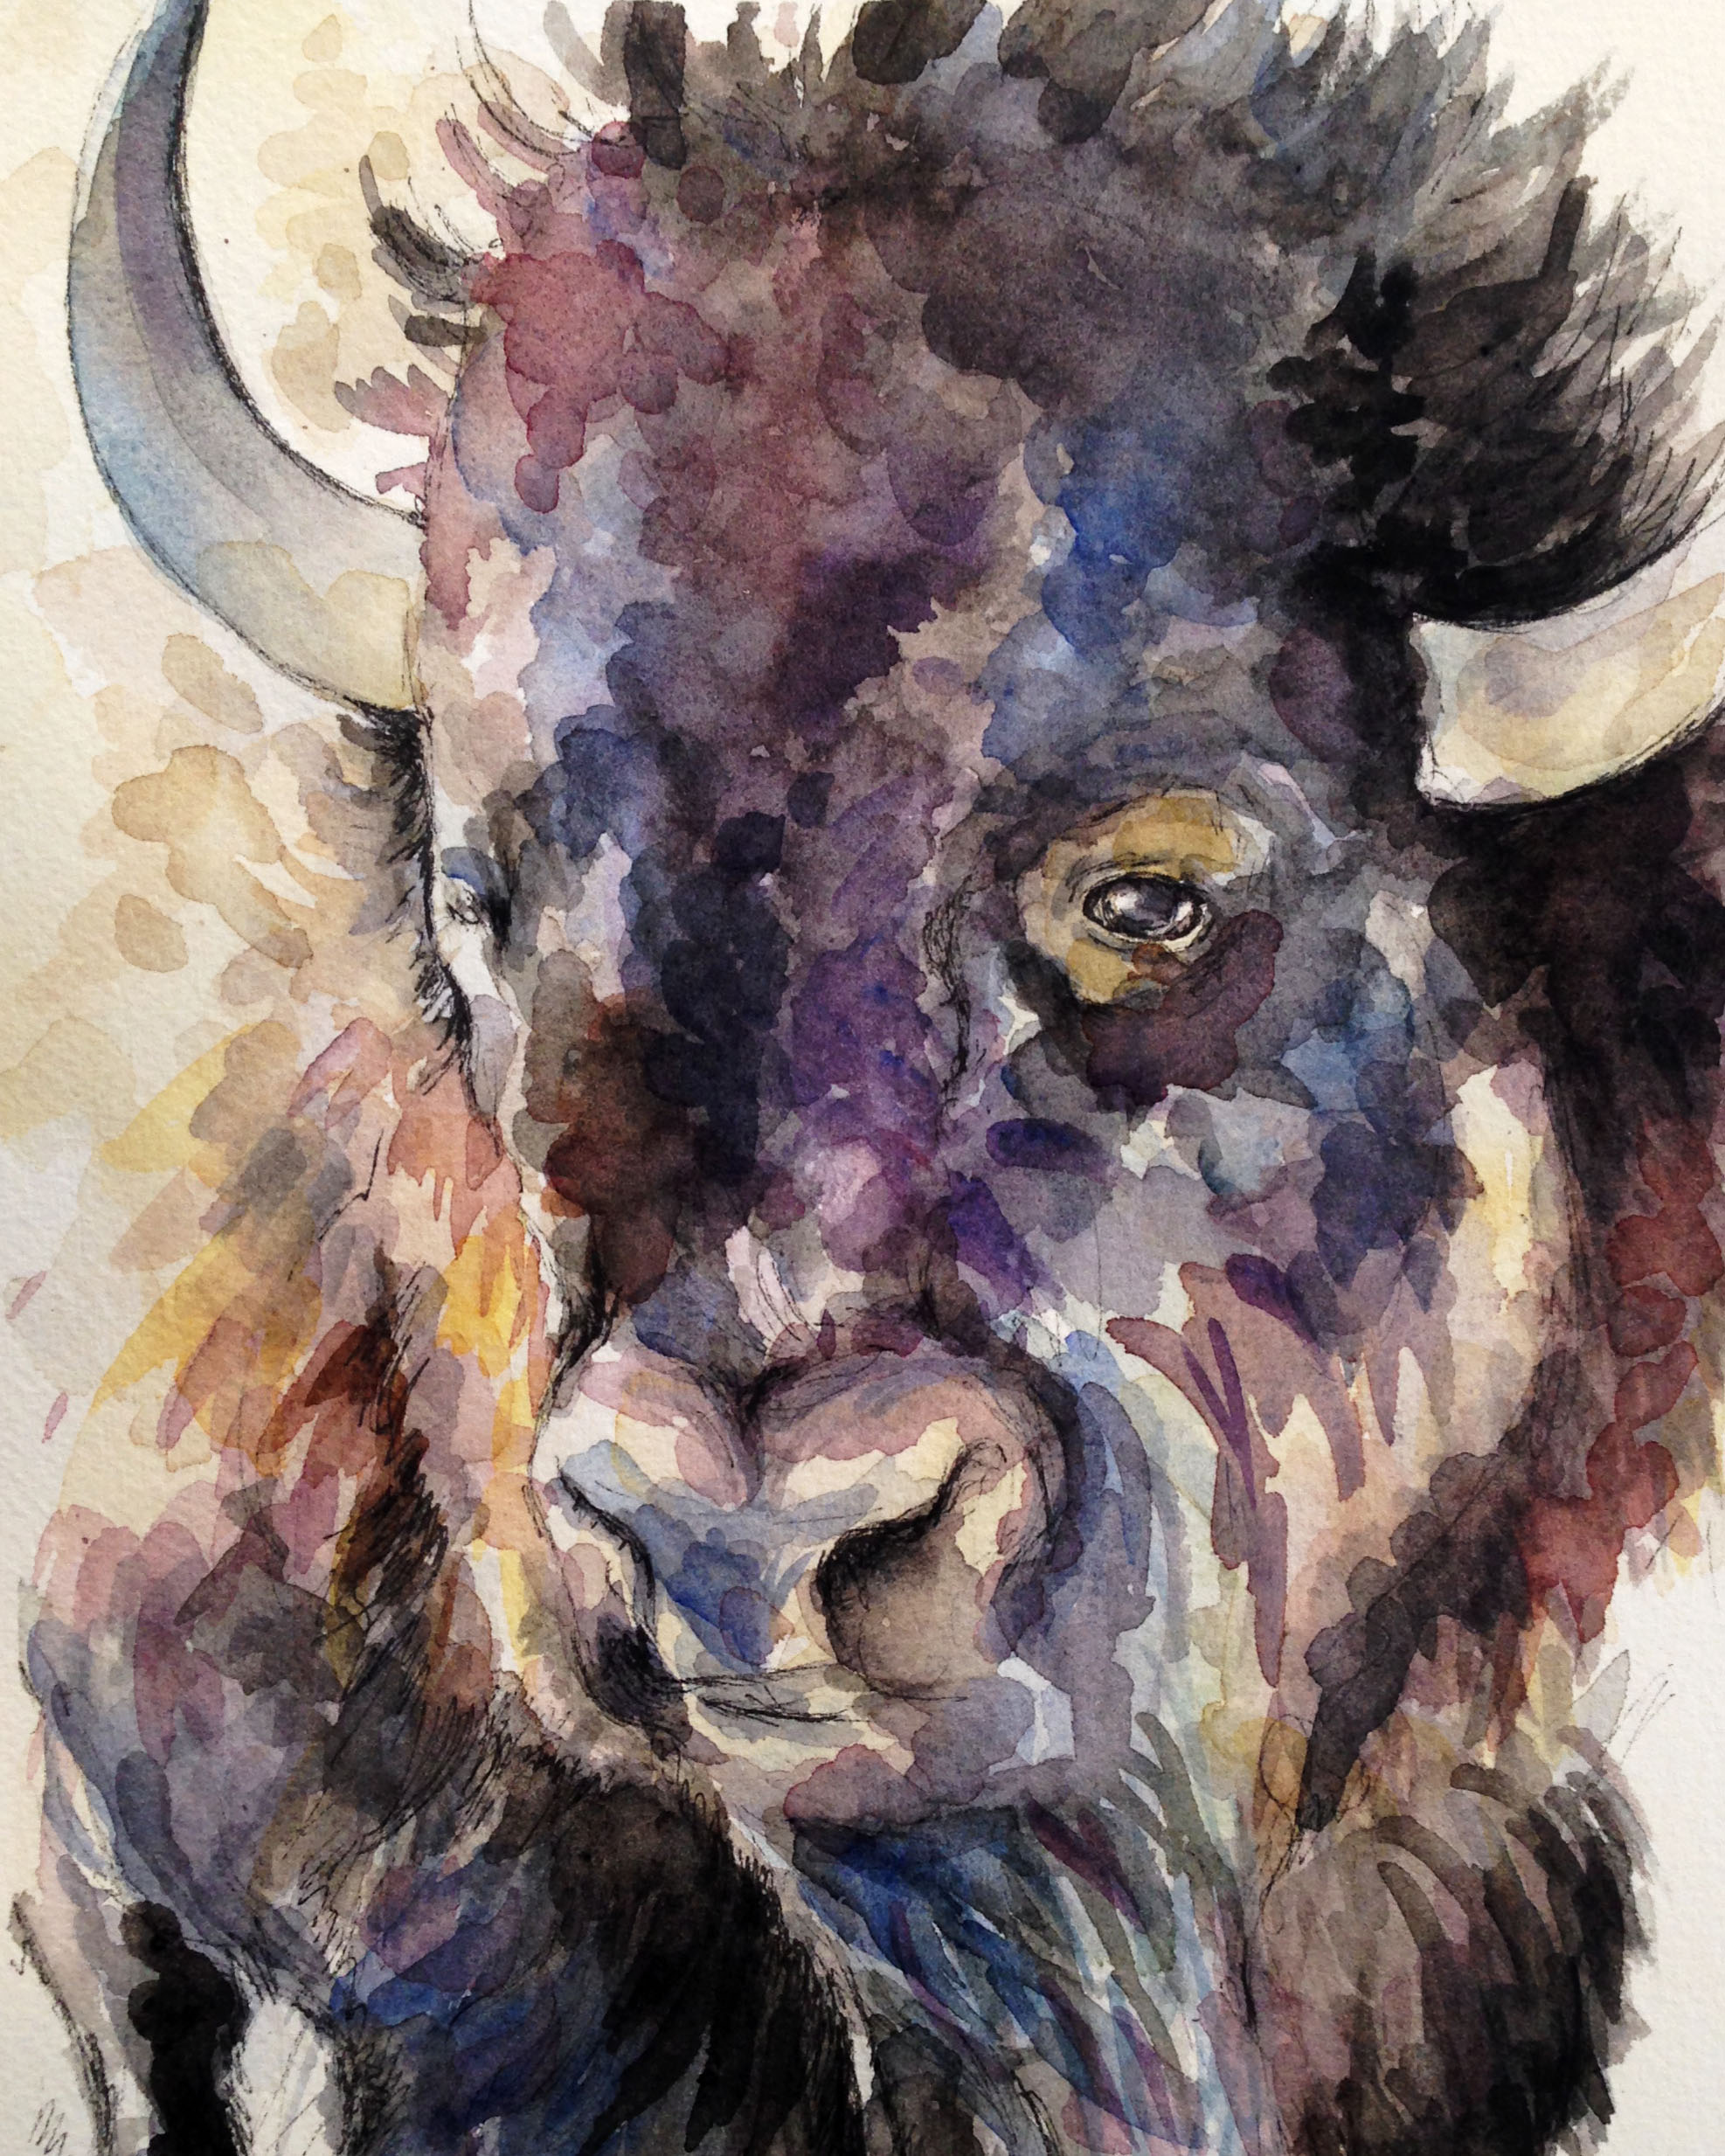 Bison Head (ORIGINAL SOLD)